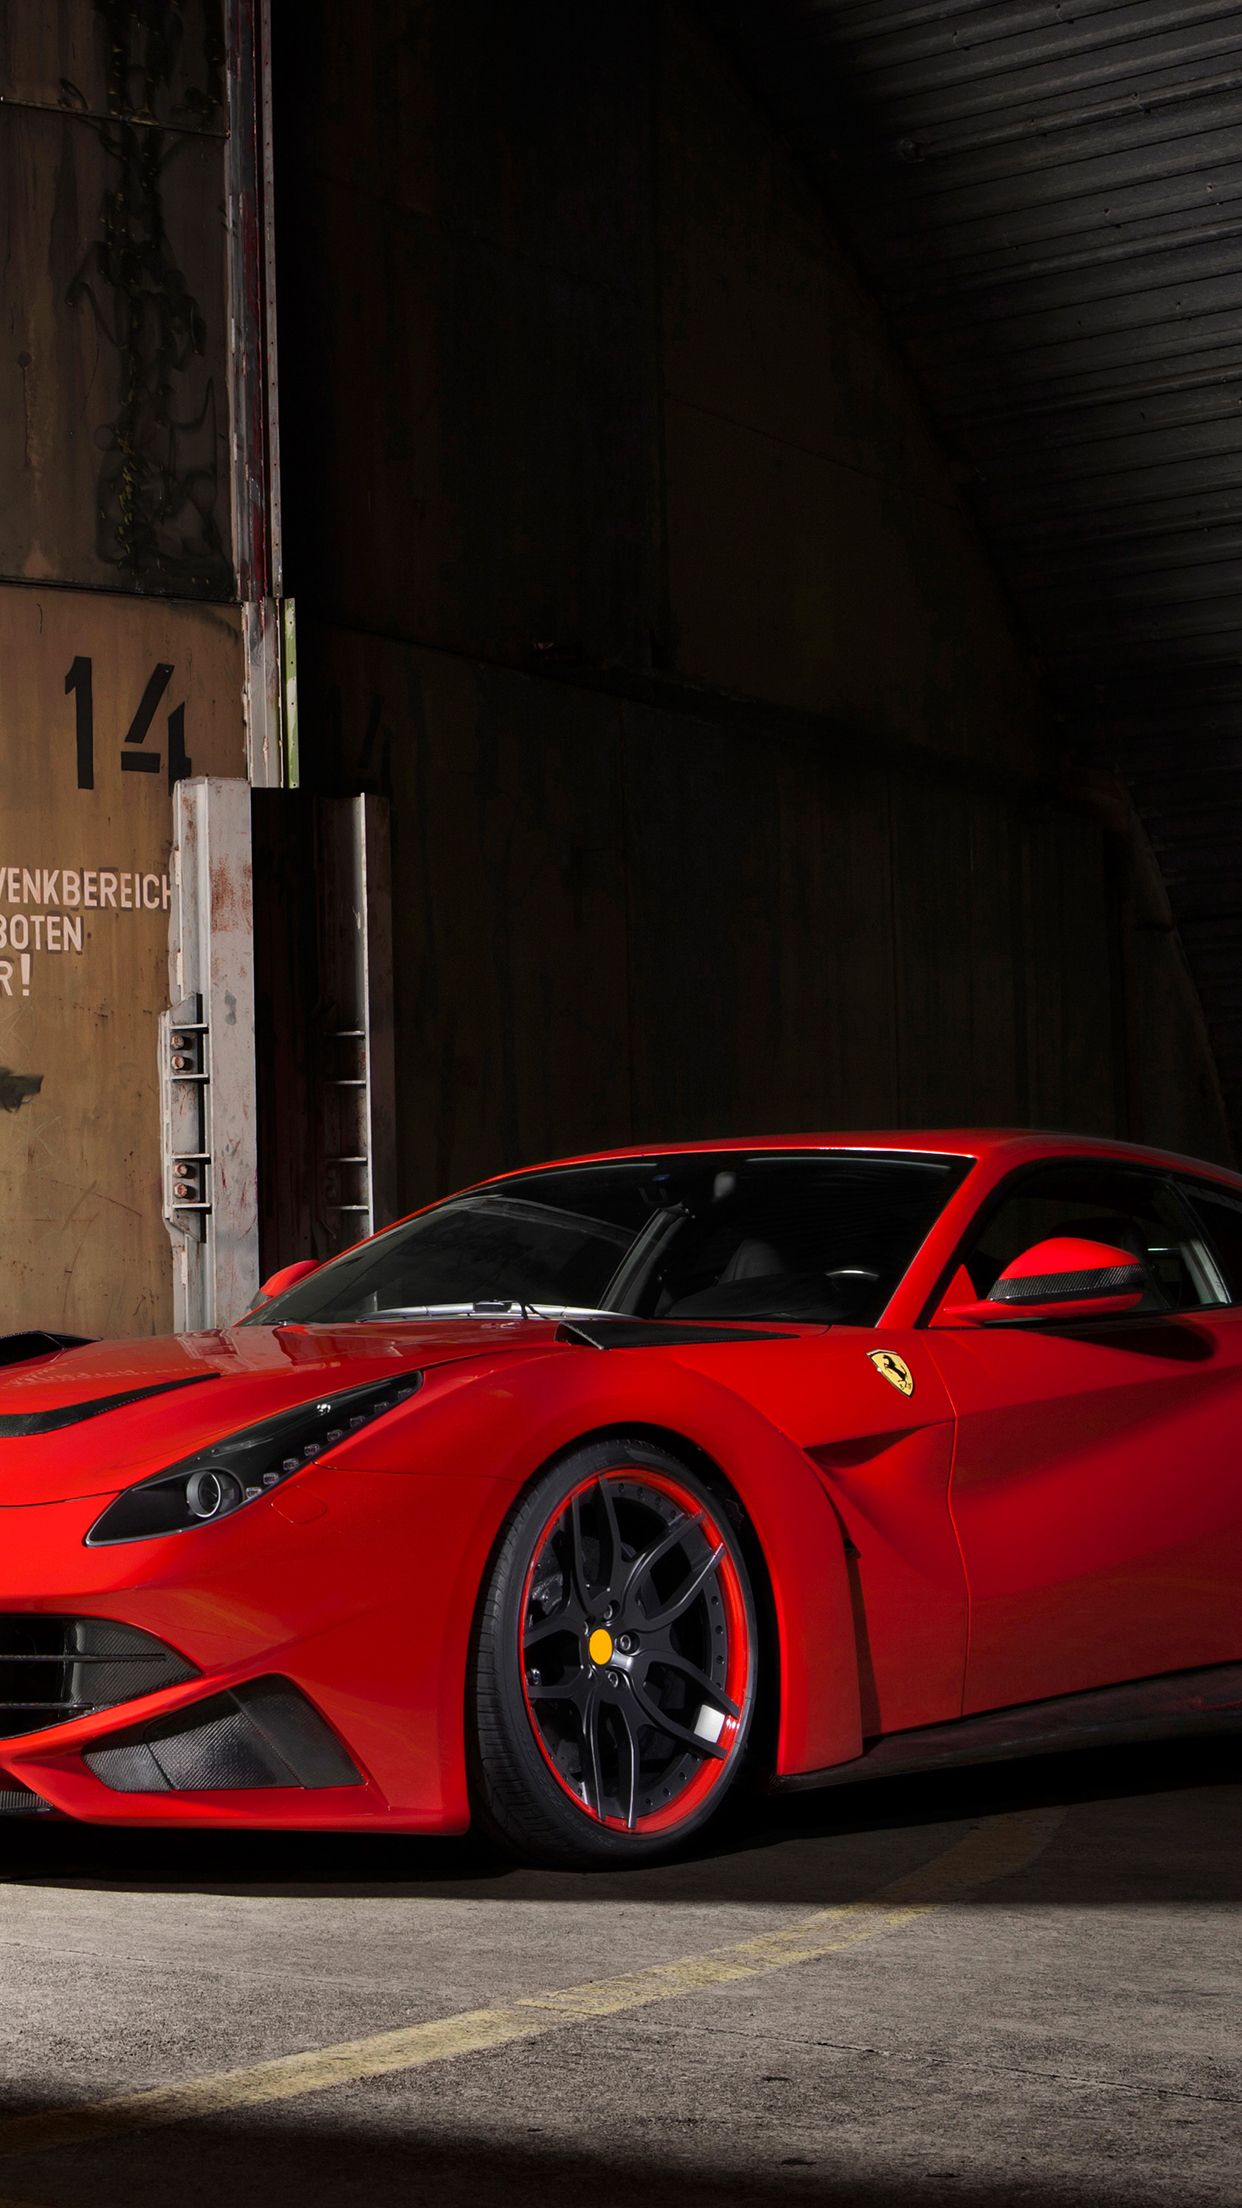 Ferrari Iphone Wallpapers Top Free Ferrari Iphone